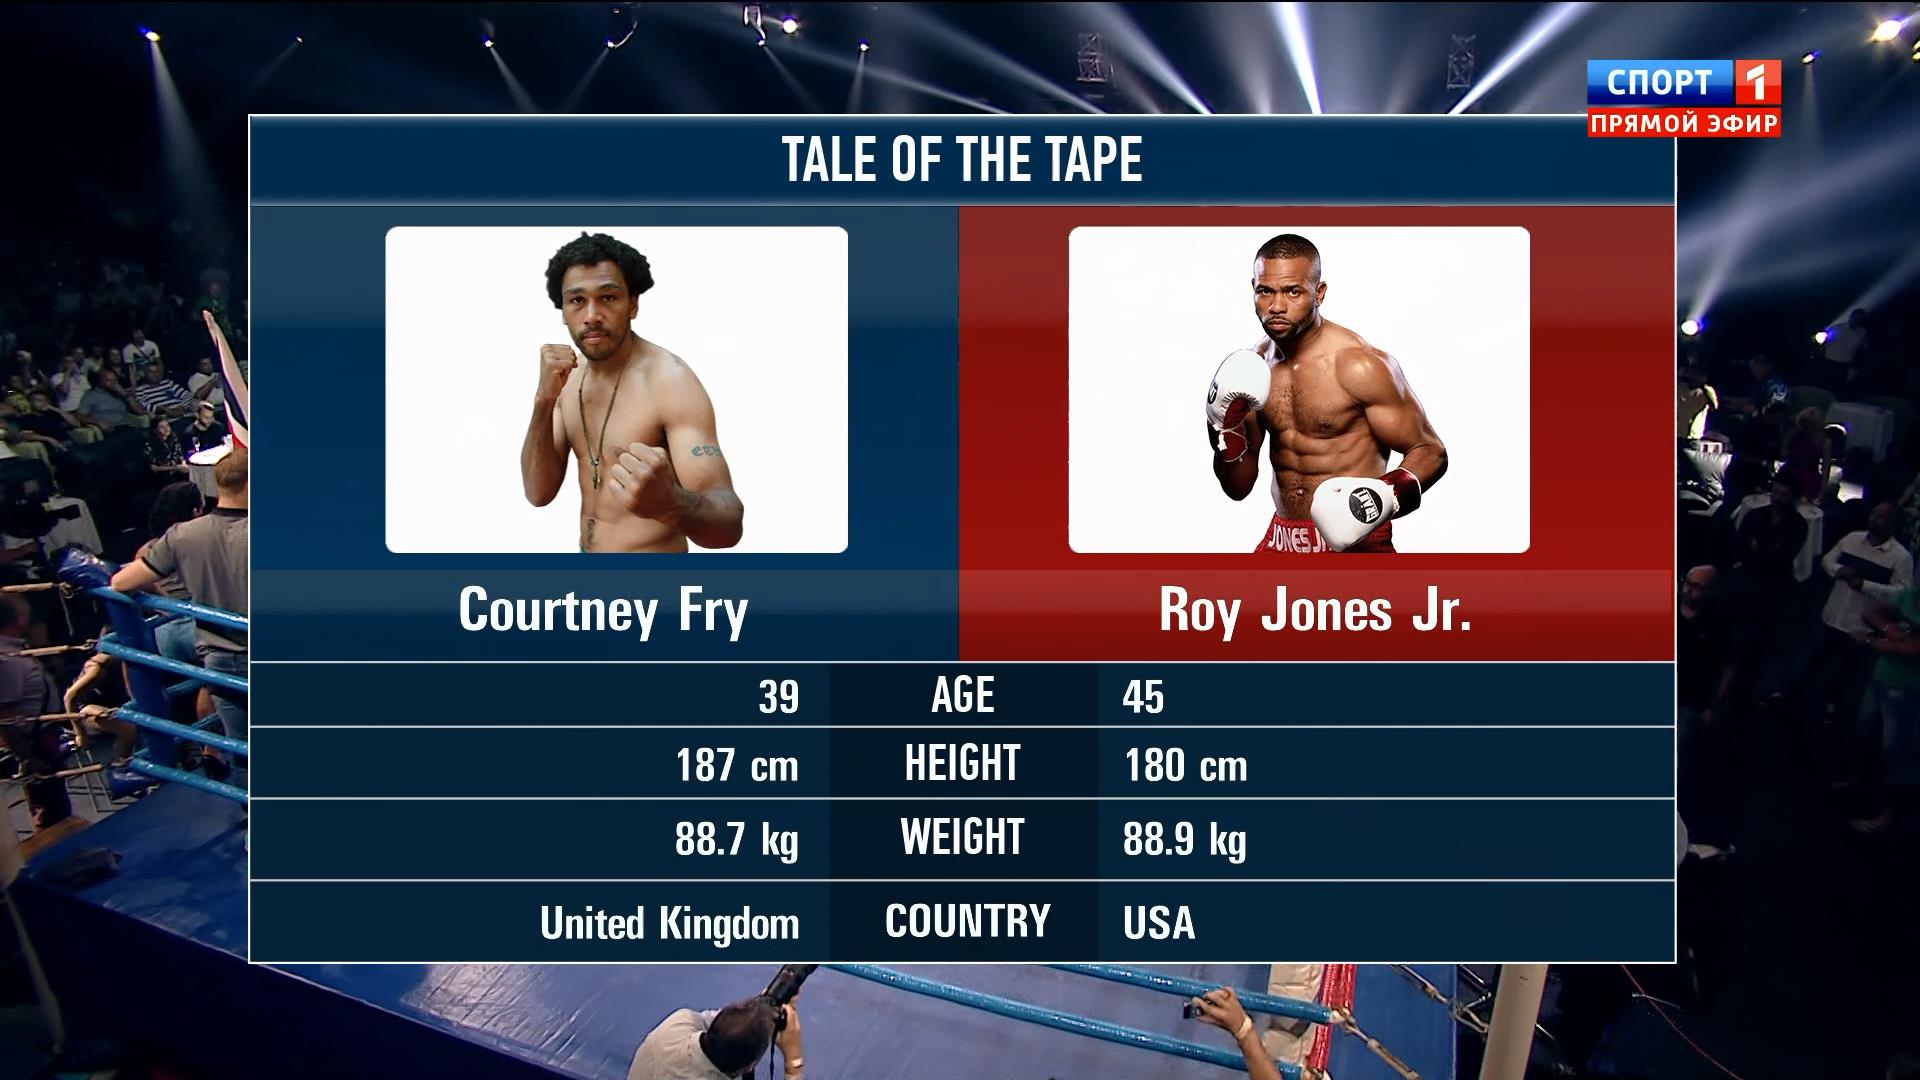 Roy Jones jr. vs Courtney Fry / Рой Джонс мл. - Кортни Фрай (Вечер бокса в Риге) [26 / 07 / 2014, Бокс, HDTV, RU]